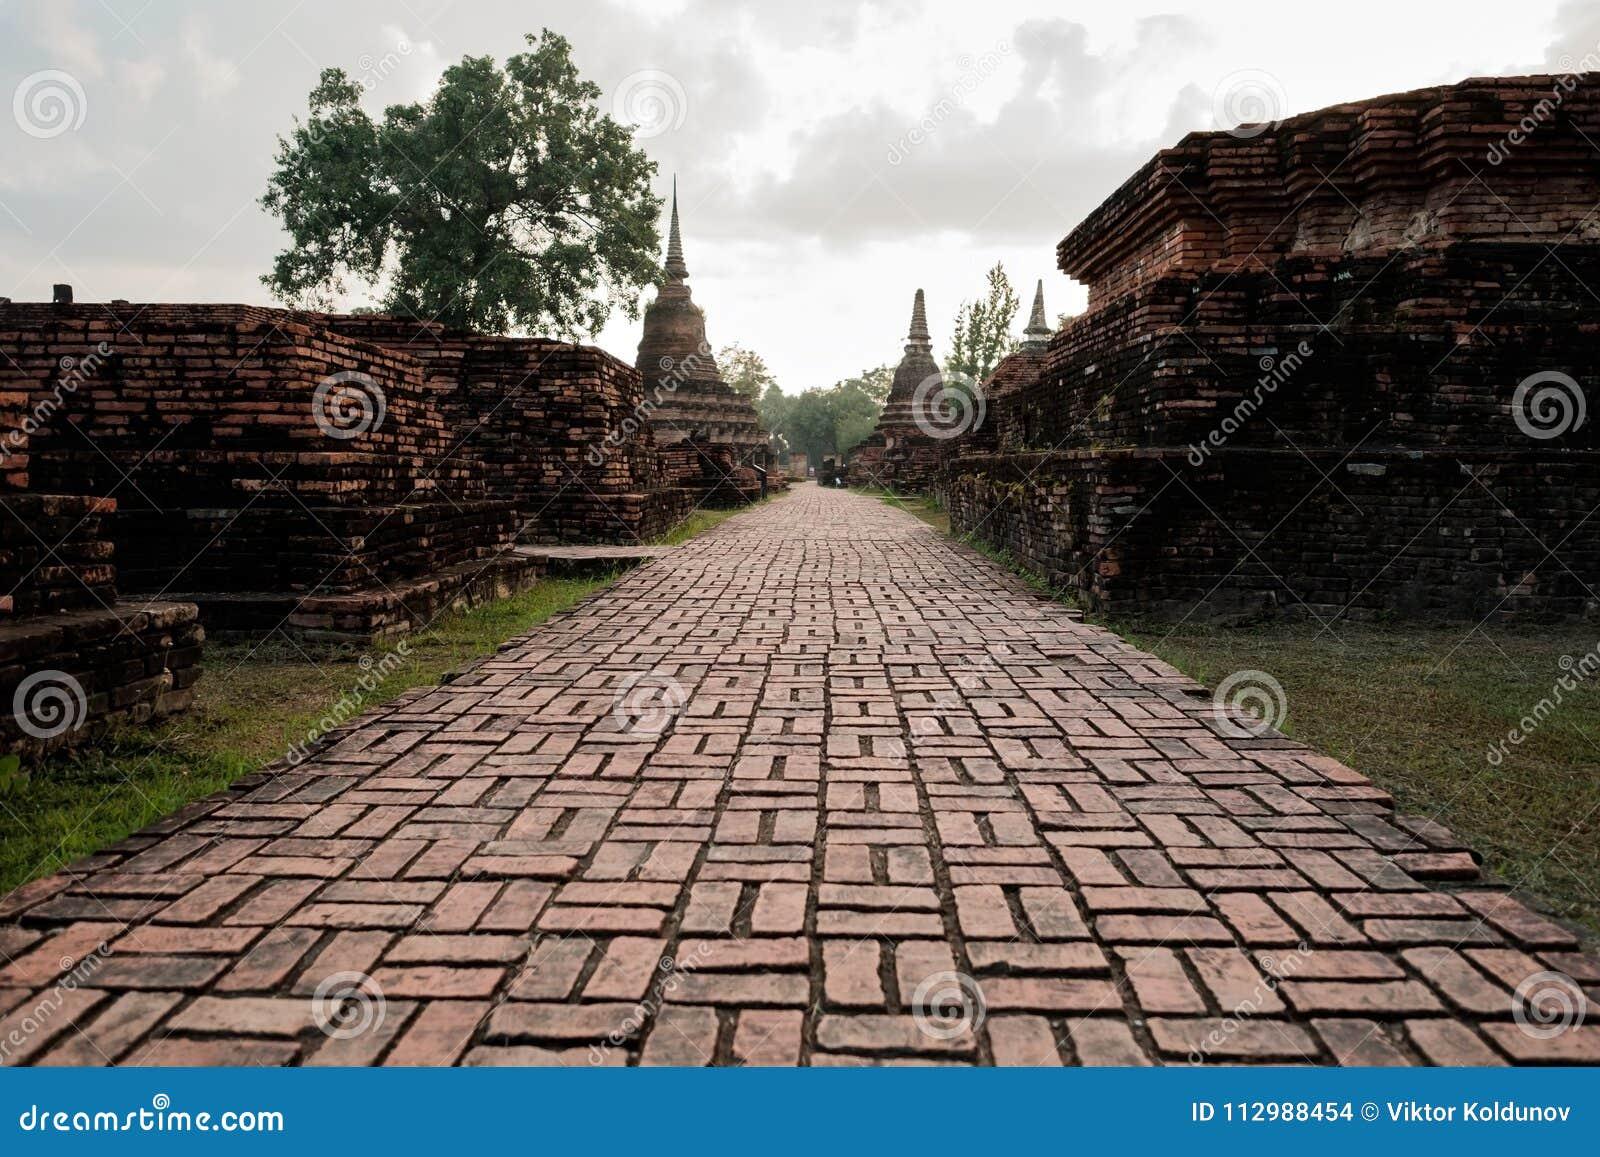 Sukhotha, Thailand - November 20, 2017: Wat Mahathat Temple in the precinct of Sukhothai Historical Park